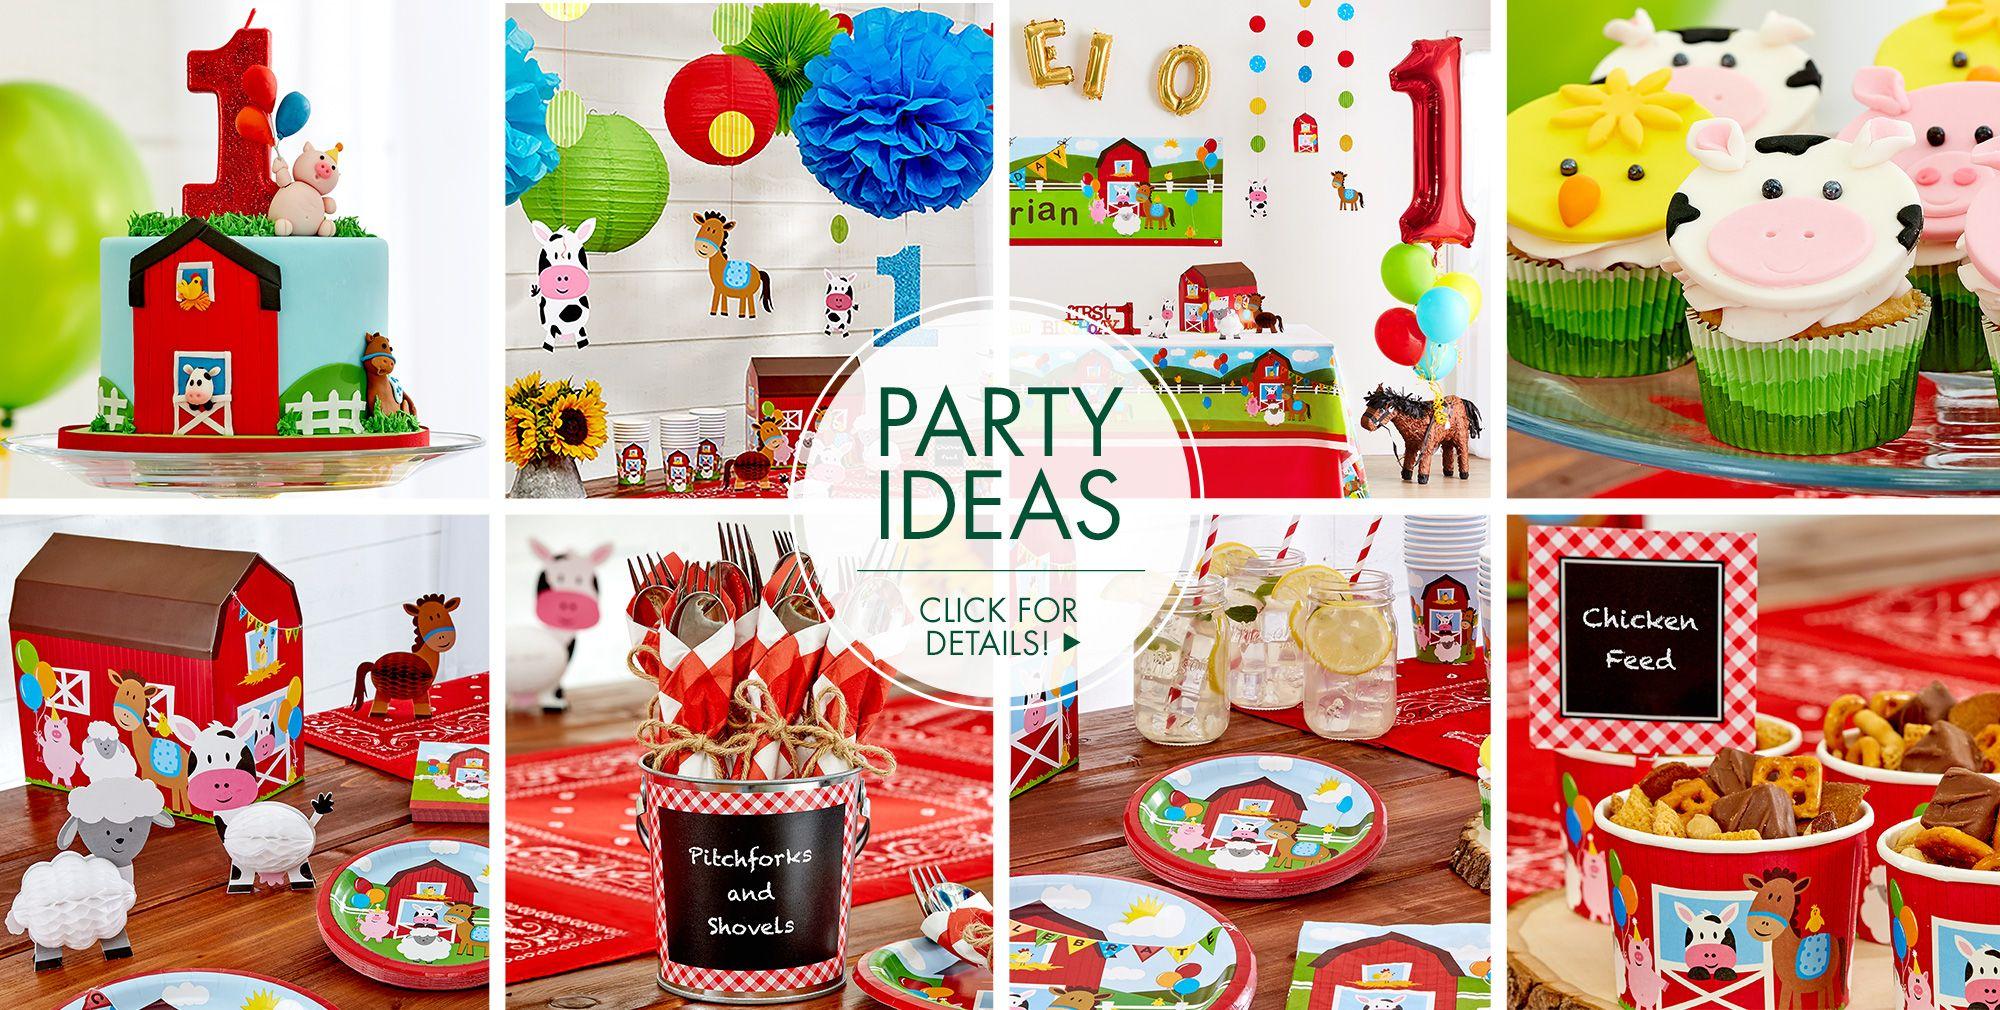 Farmhouse Fun First Birthday Party Ideas